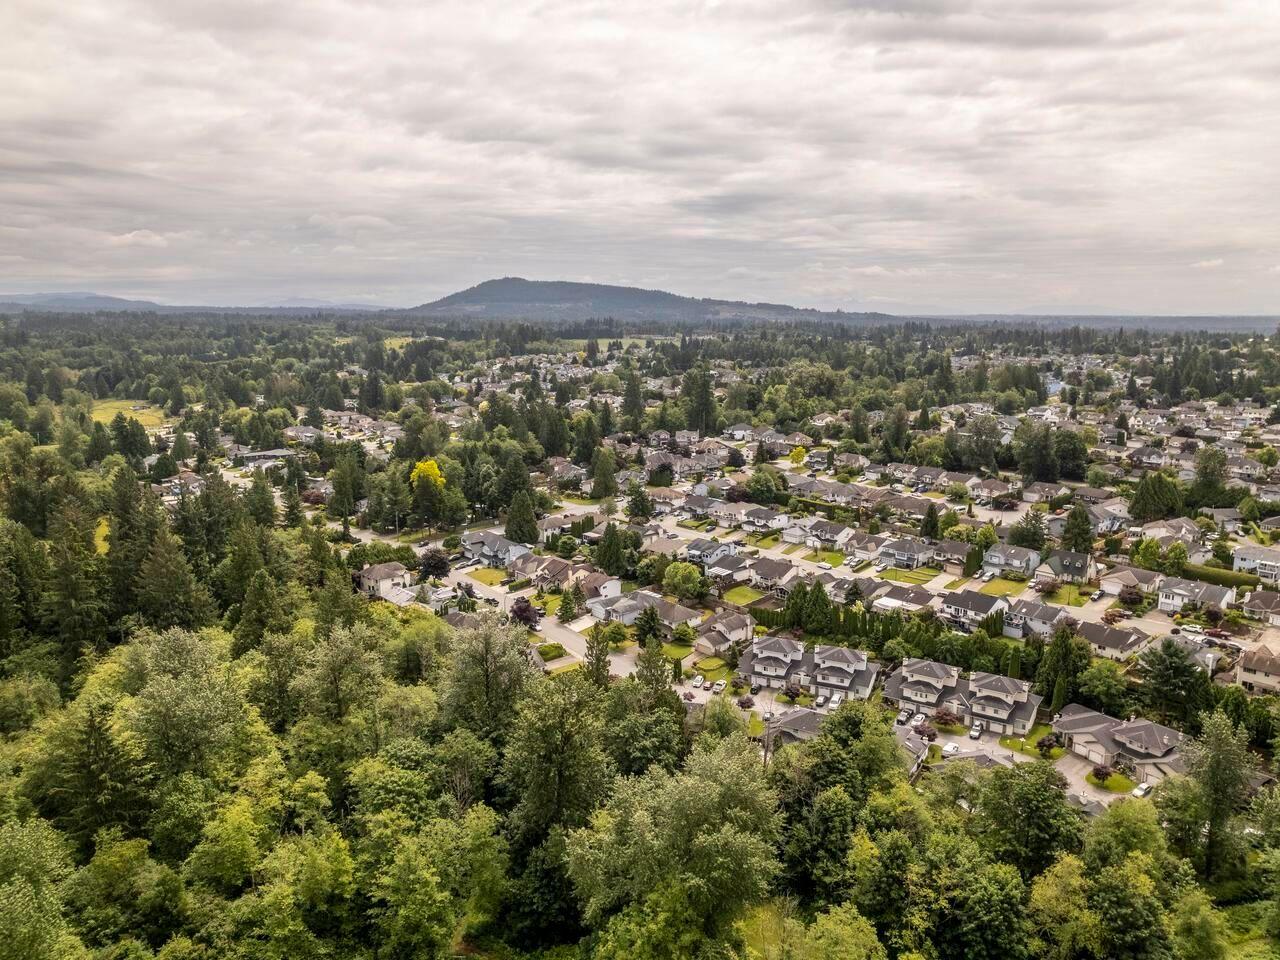 "Photo 39: Photos: 22845 126B Avenue in Maple Ridge: East Central House for sale in ""EAST CENTRAL MAPLE RIDGE"" : MLS®# R2594638"